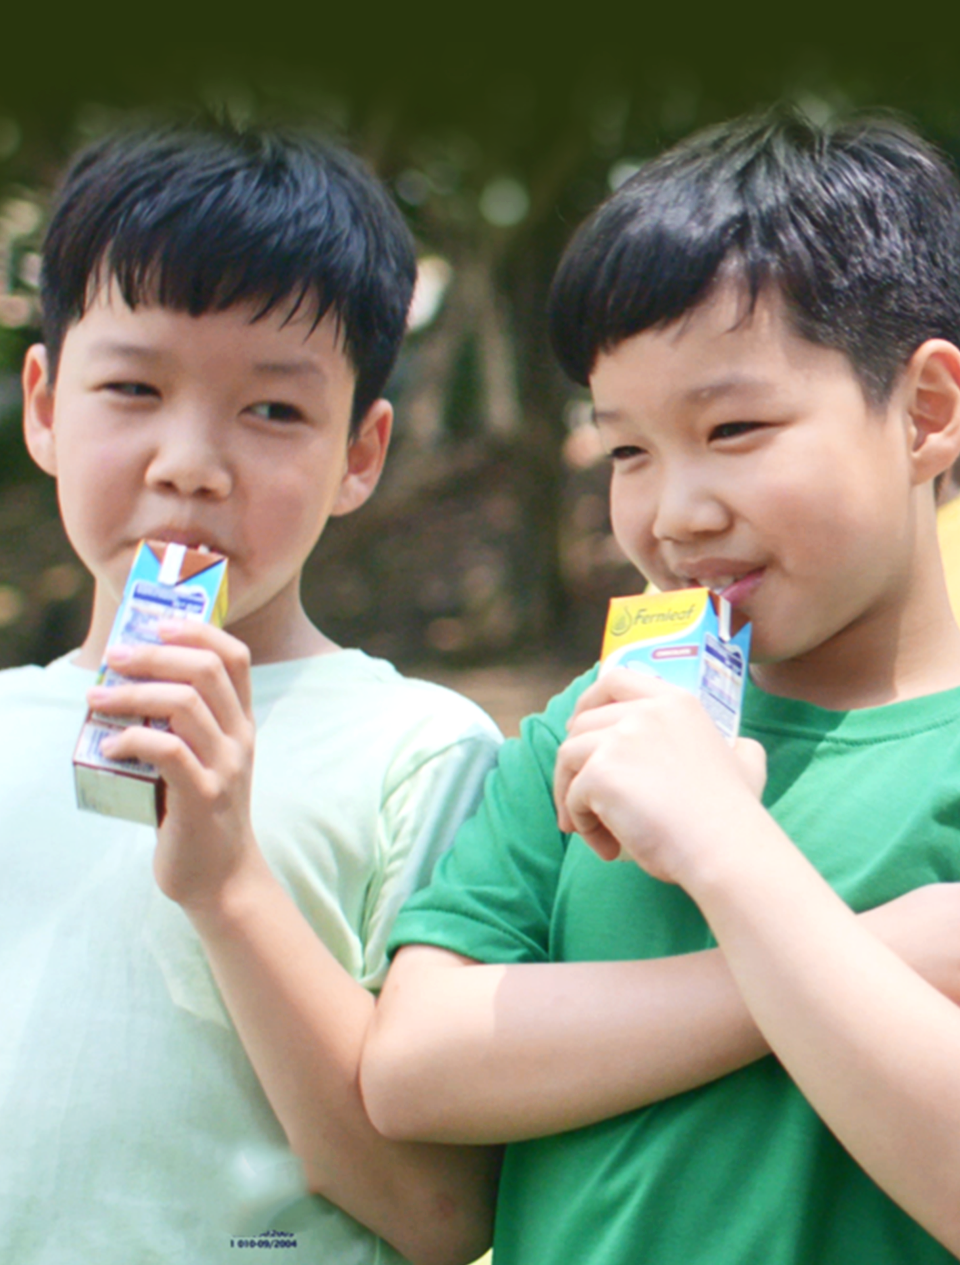 UHT Milk - Made From 100% NZ Sourced Milk, Full Cream & Low Fat | Fernleaf - MY